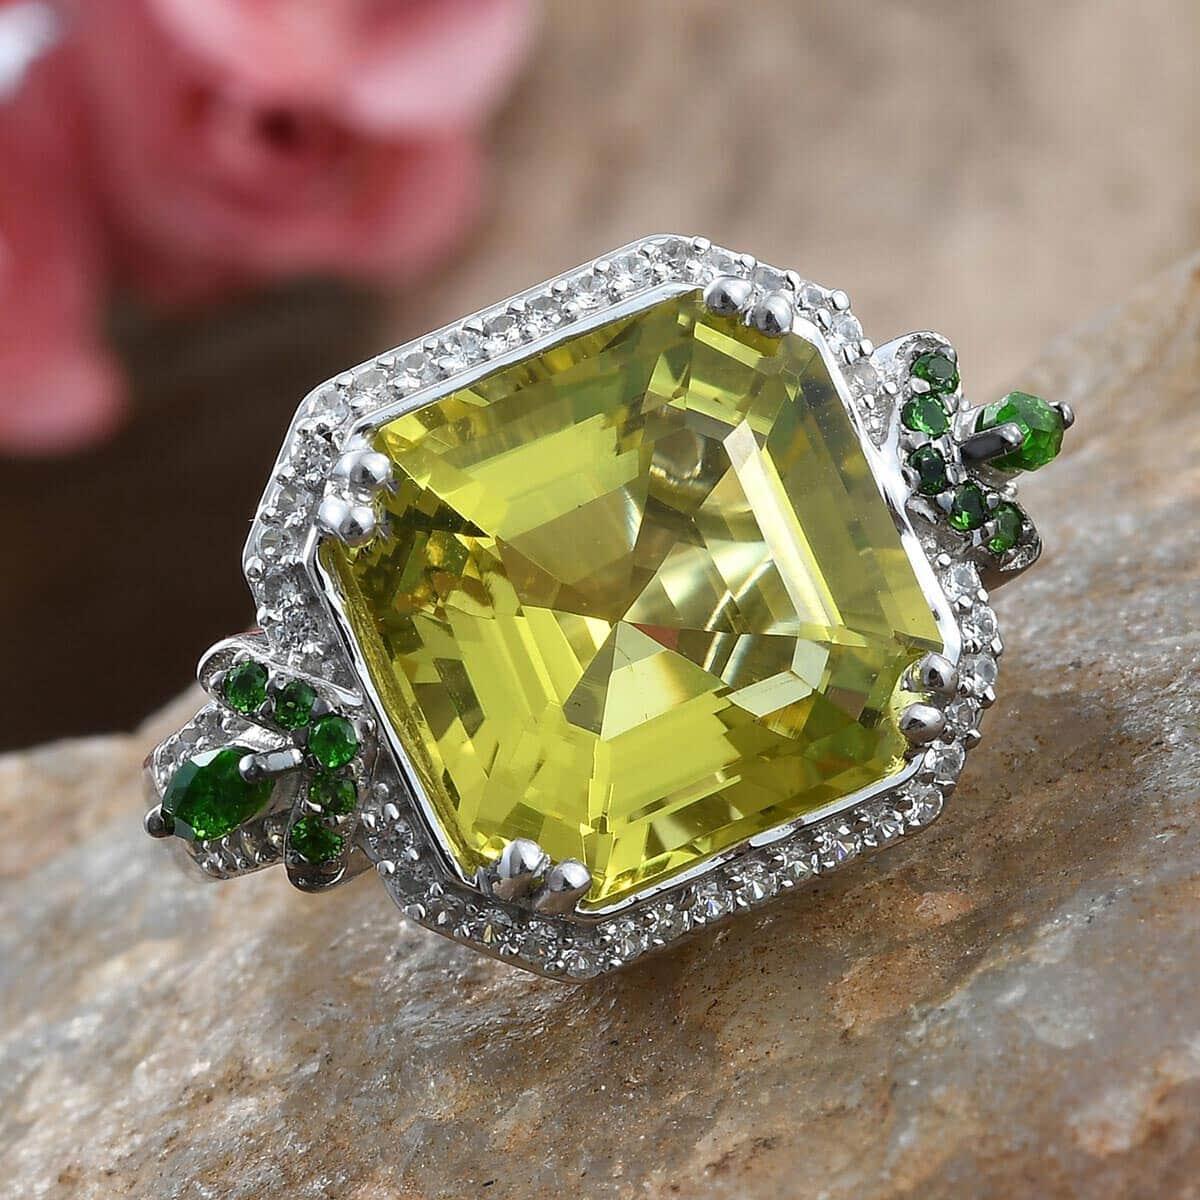 Asscher Cut Ouro Verde Quartz, Multi Gemstone Ring in Platinum Over Sterling Silver (Size 8.0) 11.20 ctw